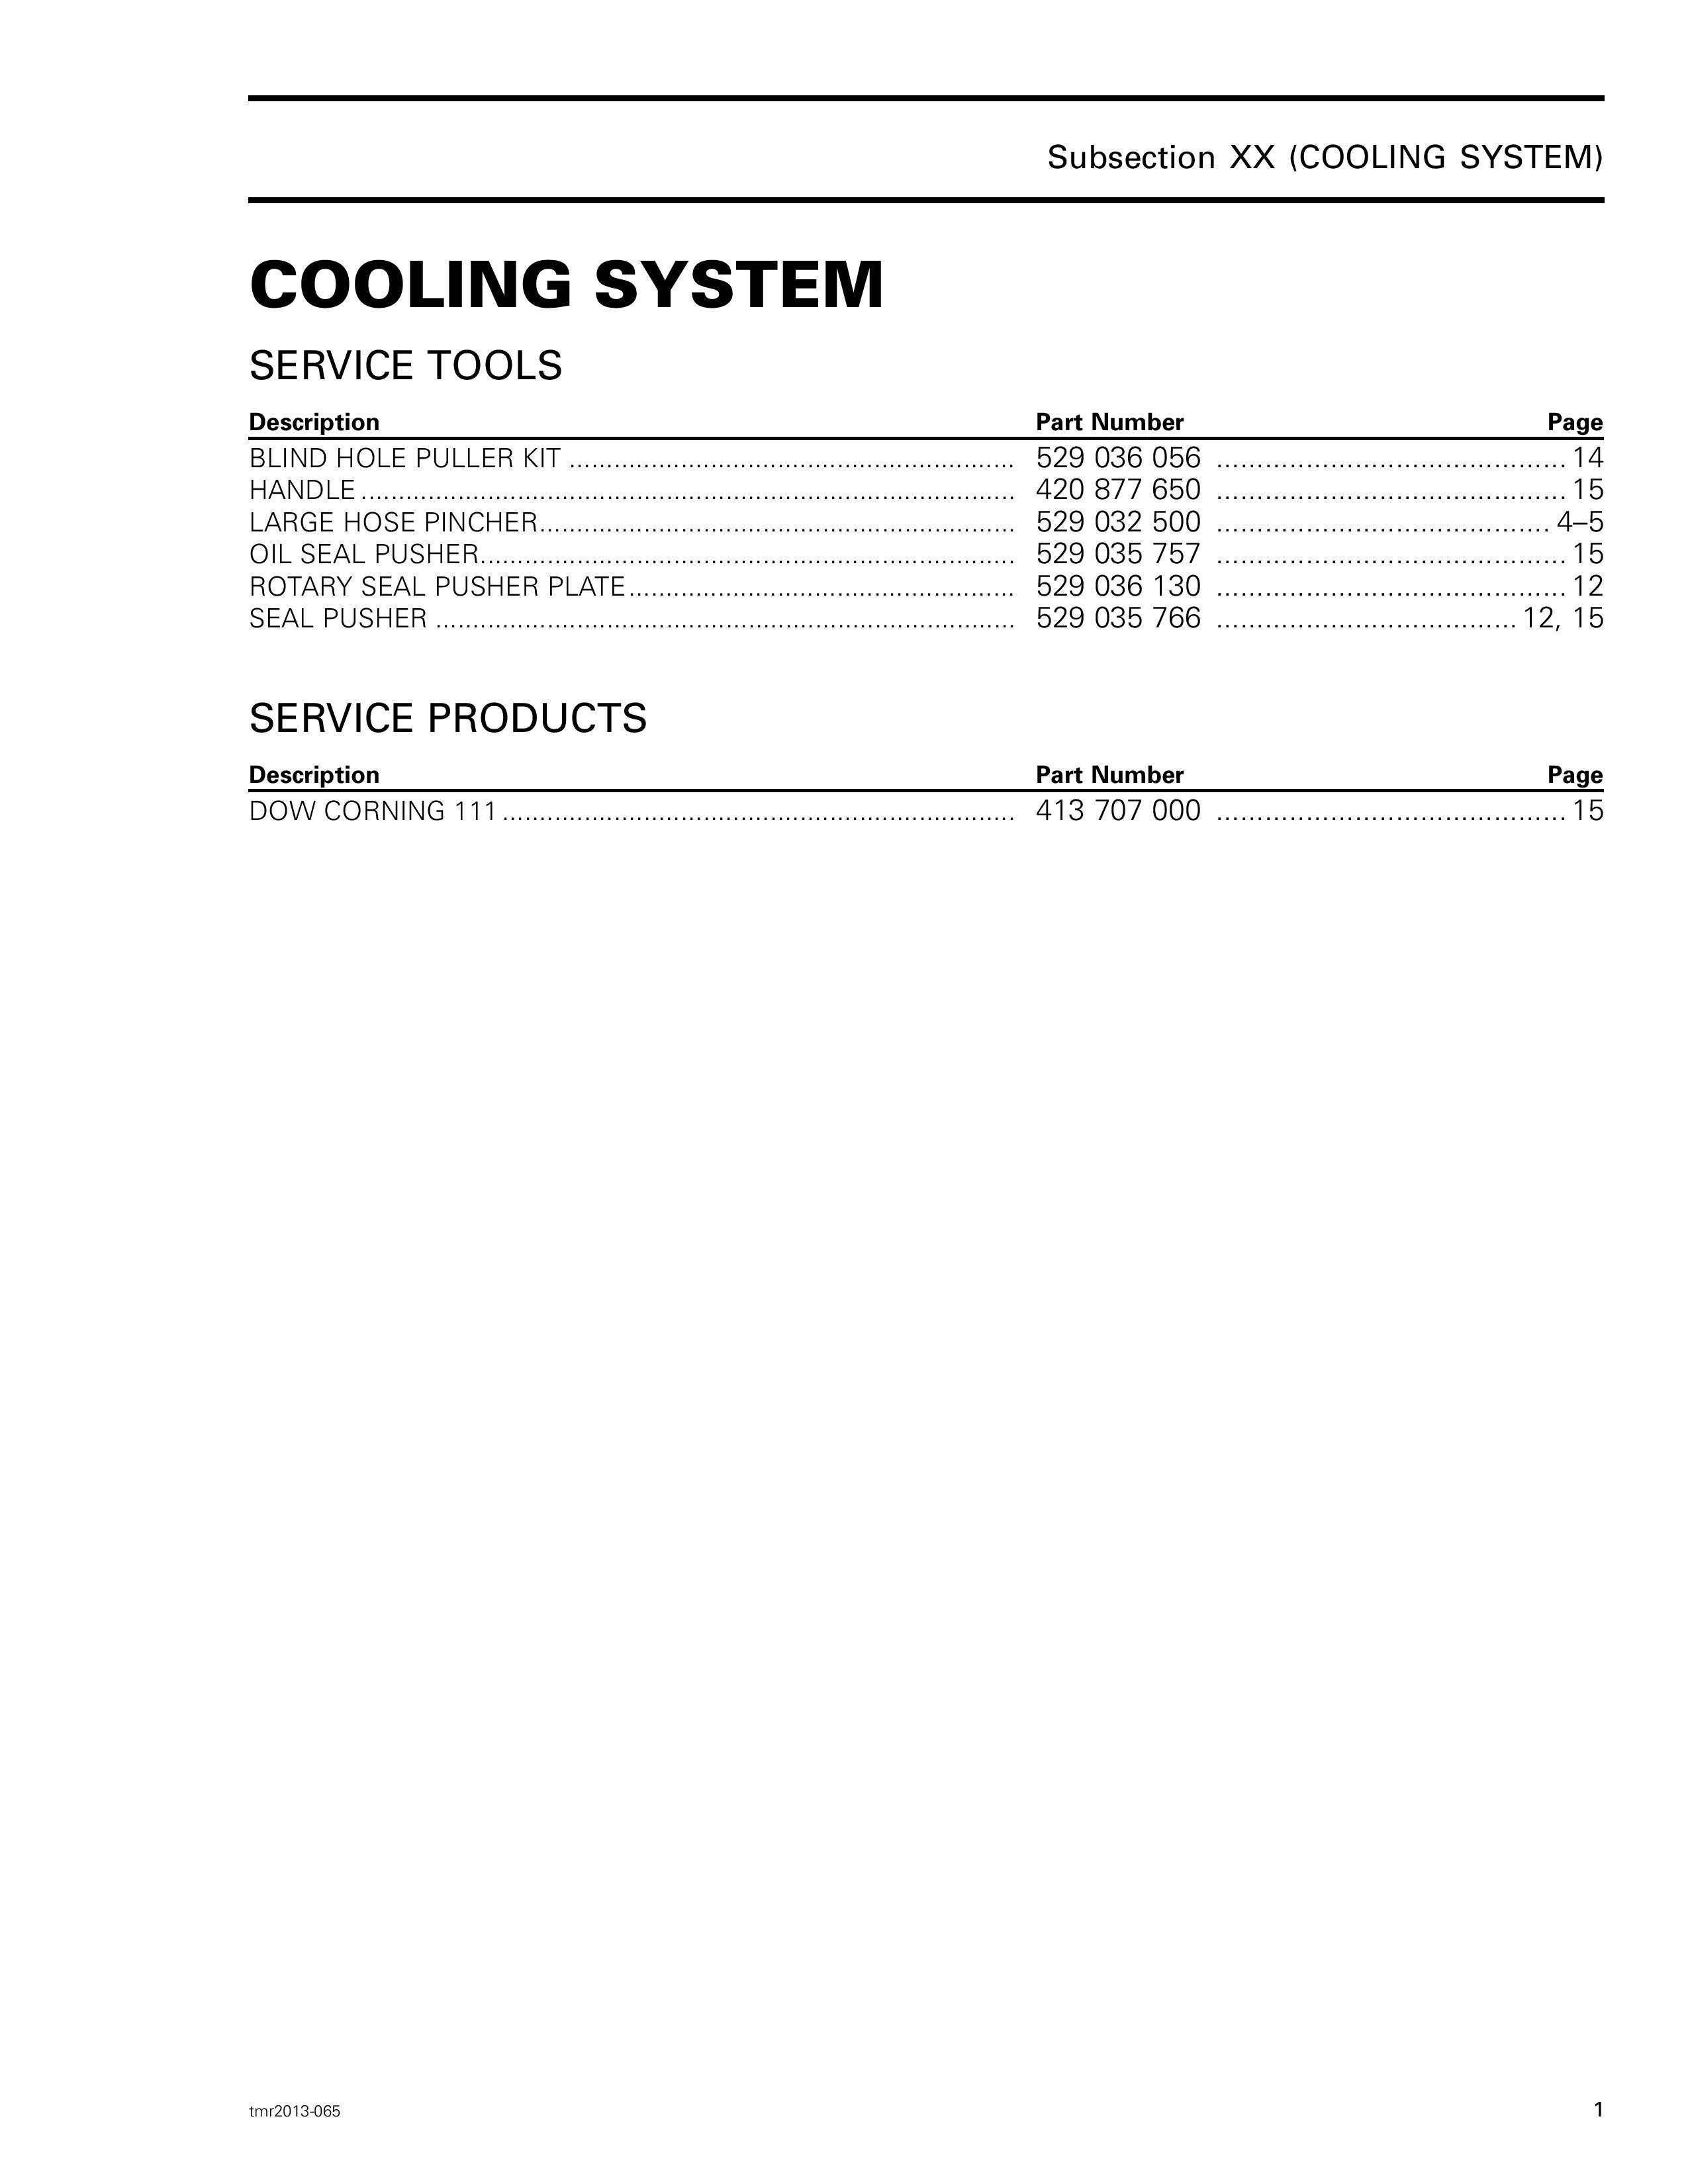 2013 Maverick Manual Engine